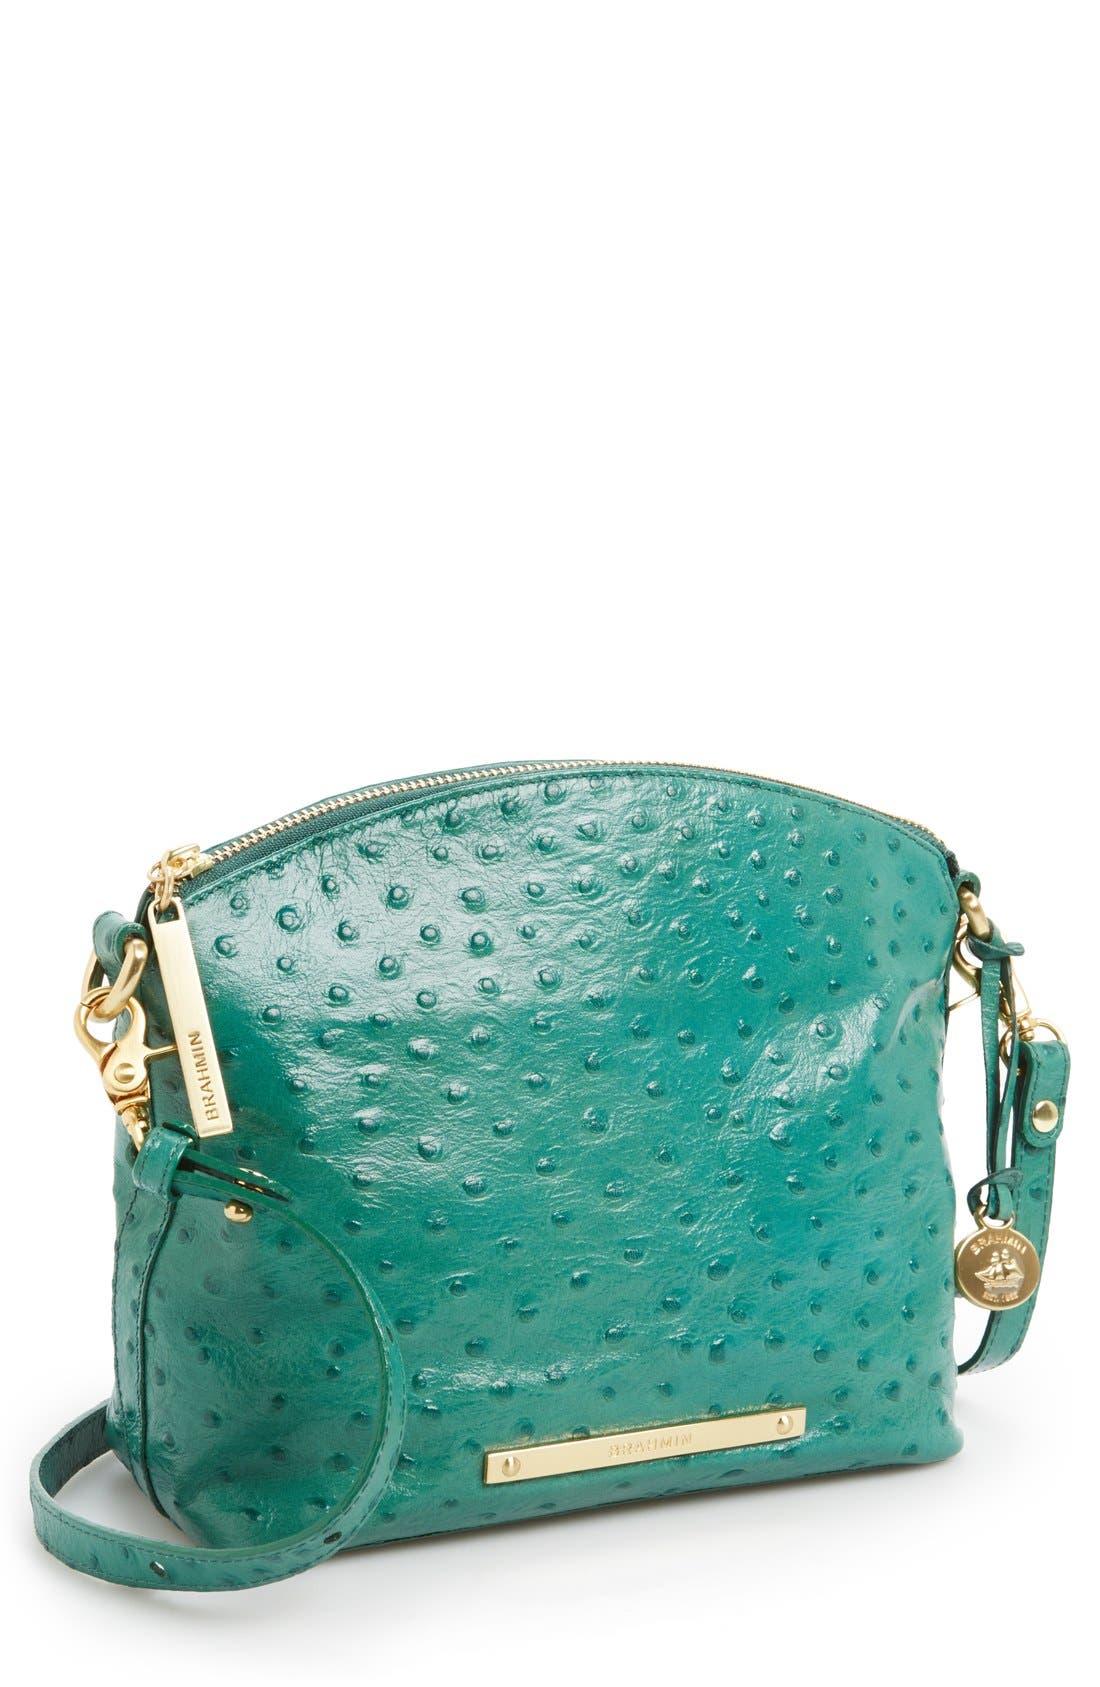 Main Image - Brahmin 'Mini Duxbury' Leather Crossbody Bag